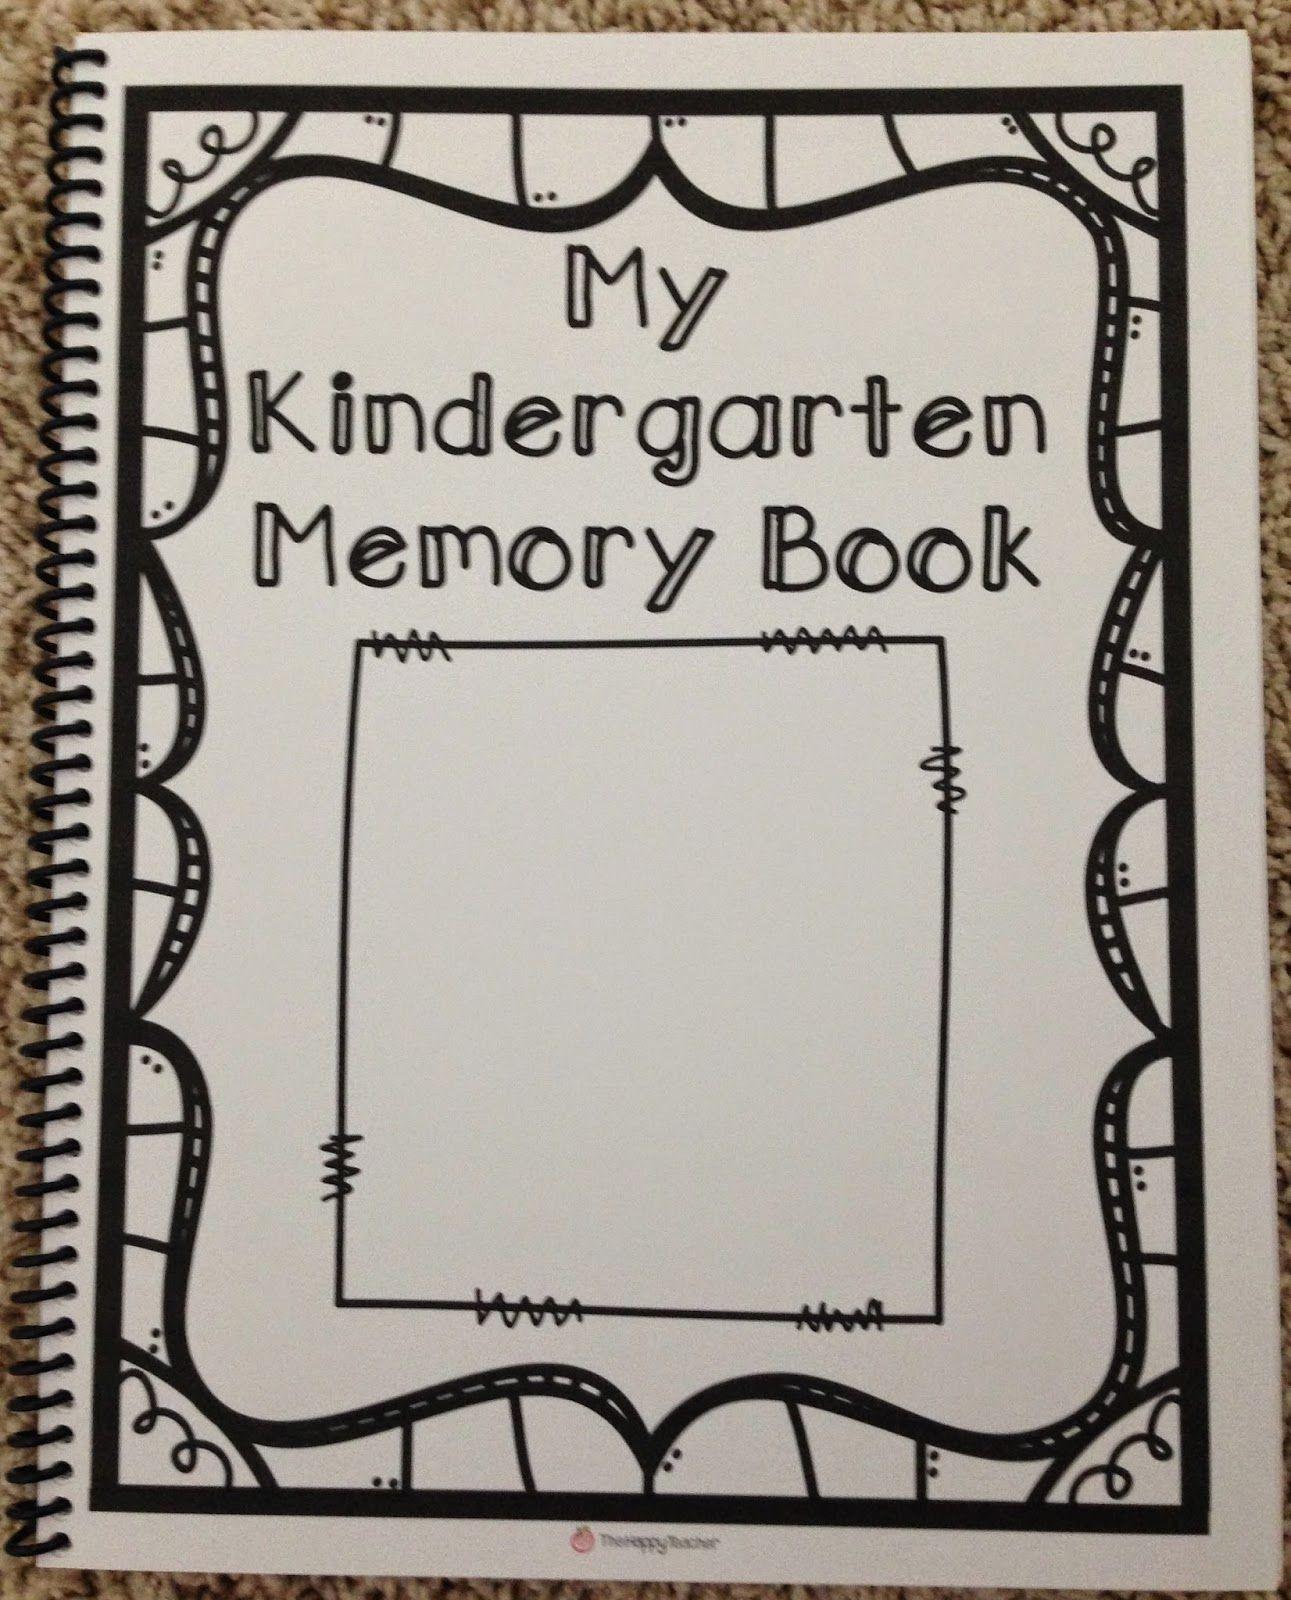 Kindergarten Memory Book | Kindergartenklub | Preschool Memory - Free Printable Preschool Memory Book